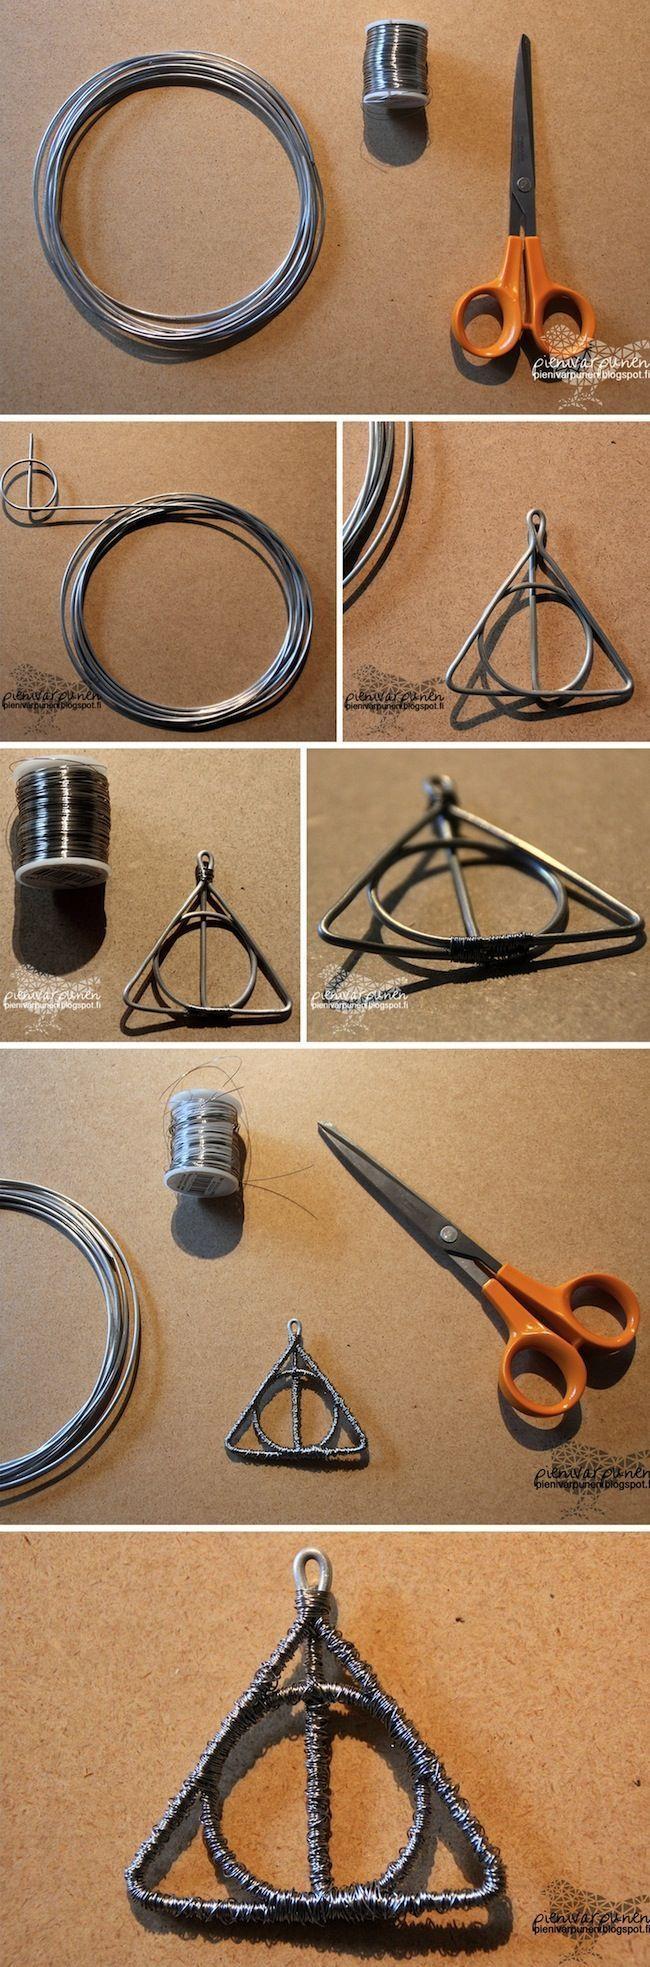 DIY – Anhänger aus Aluminiumdraht Theo Nededog DIY und Kunsthandwerk  #aluminiu…